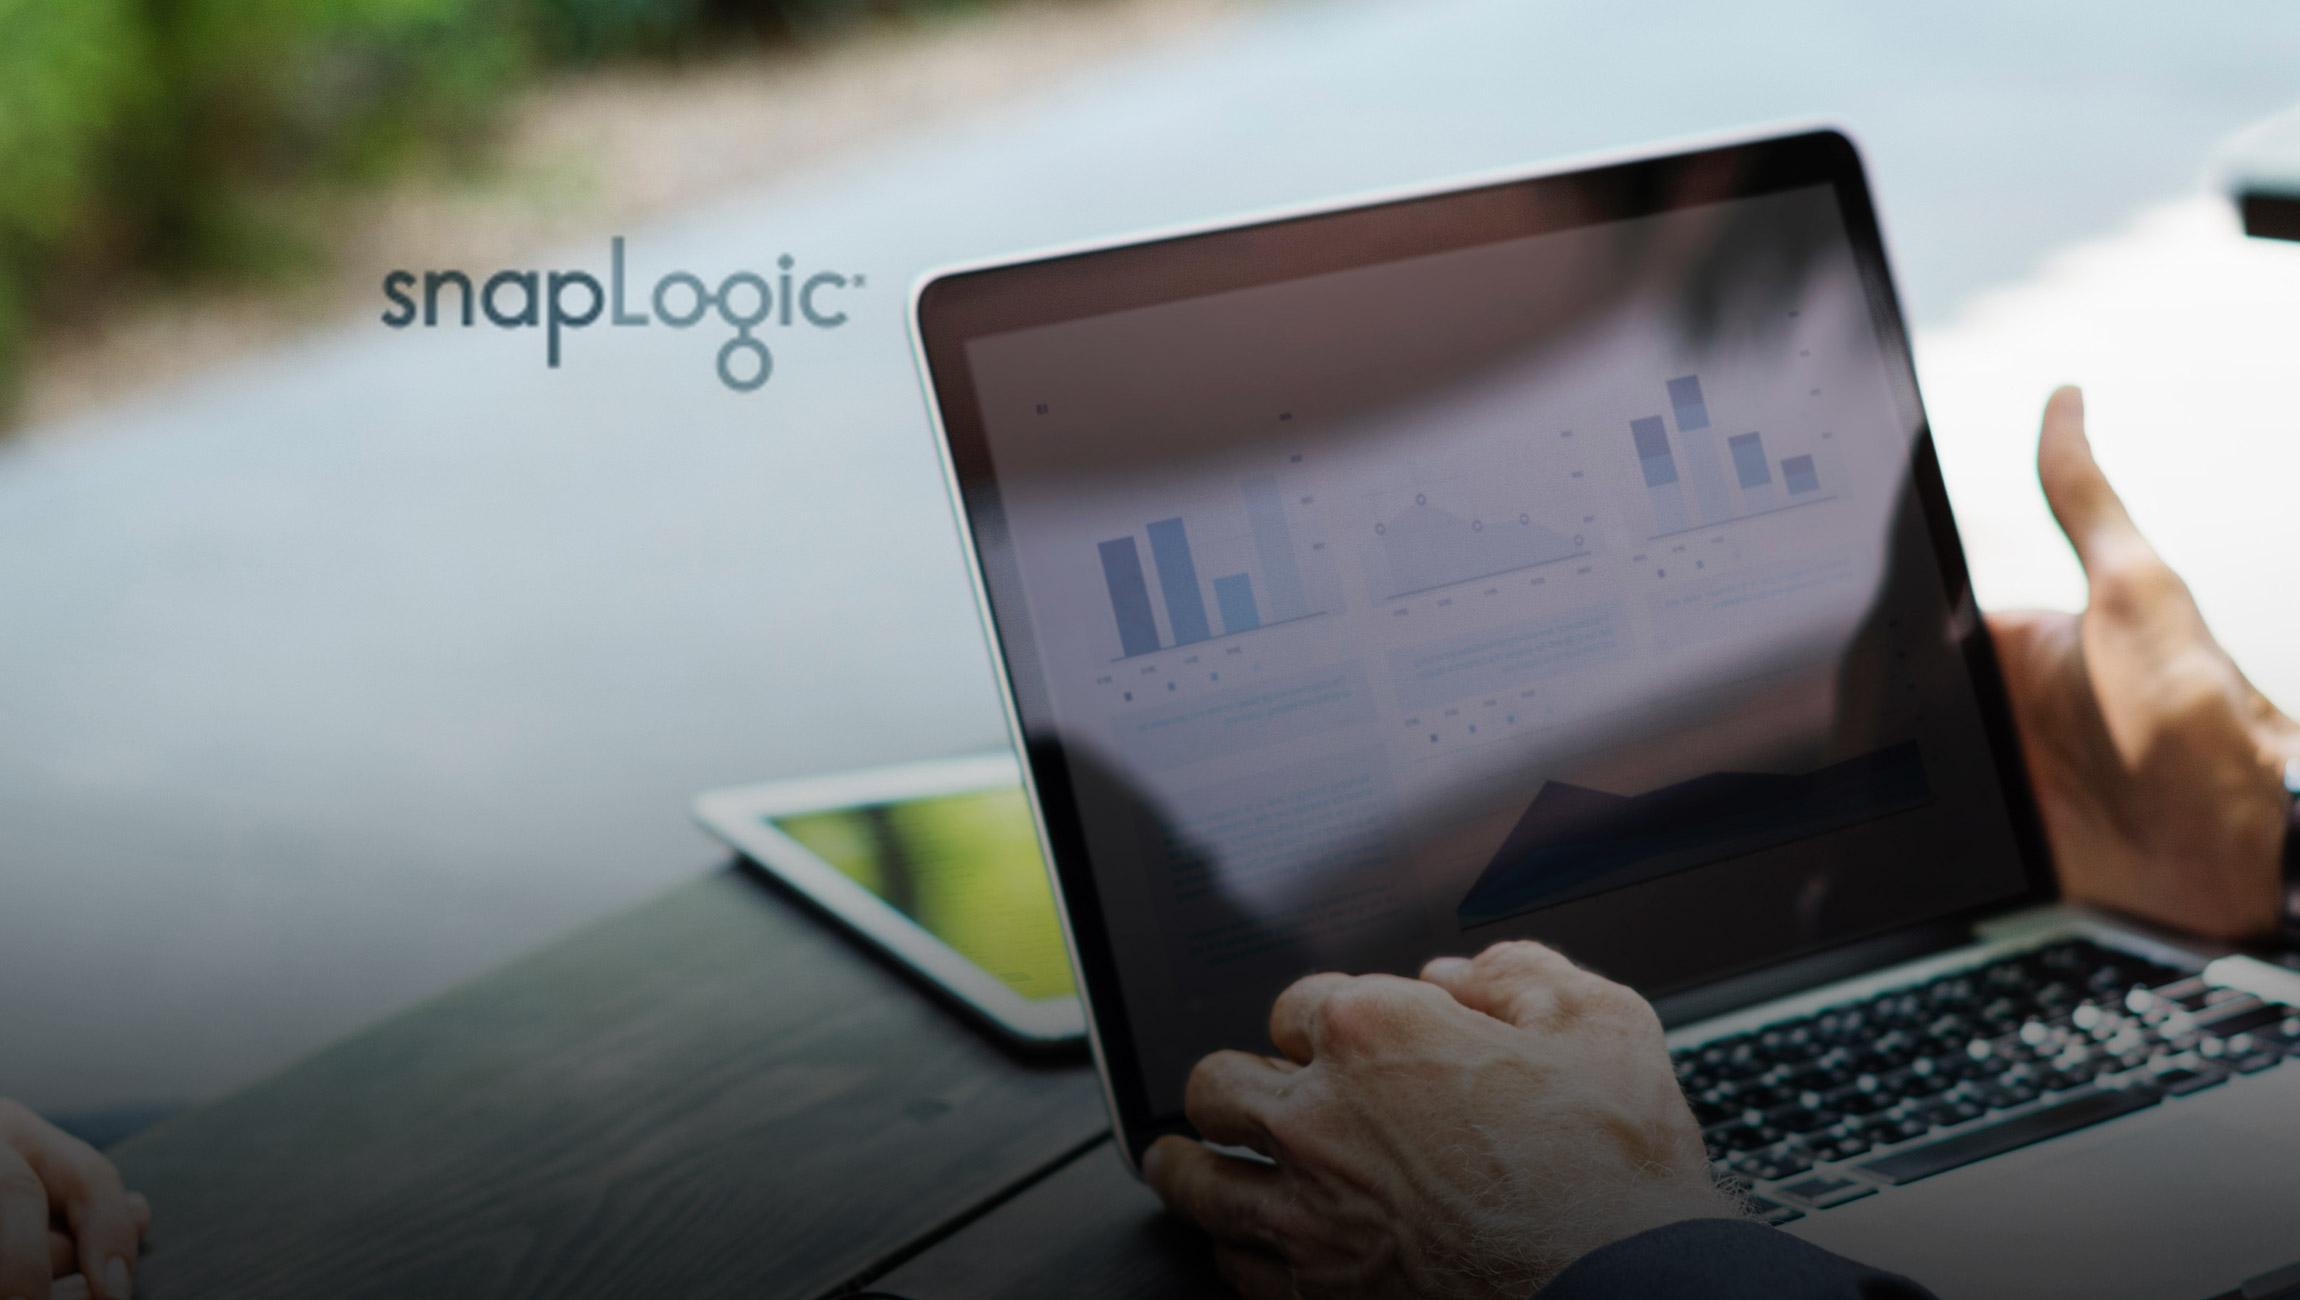 SCG Logistics Deploys the SnapLogic Integration Platform to Improve Process Optimization, Data-driven Insights, and Operational Excellence